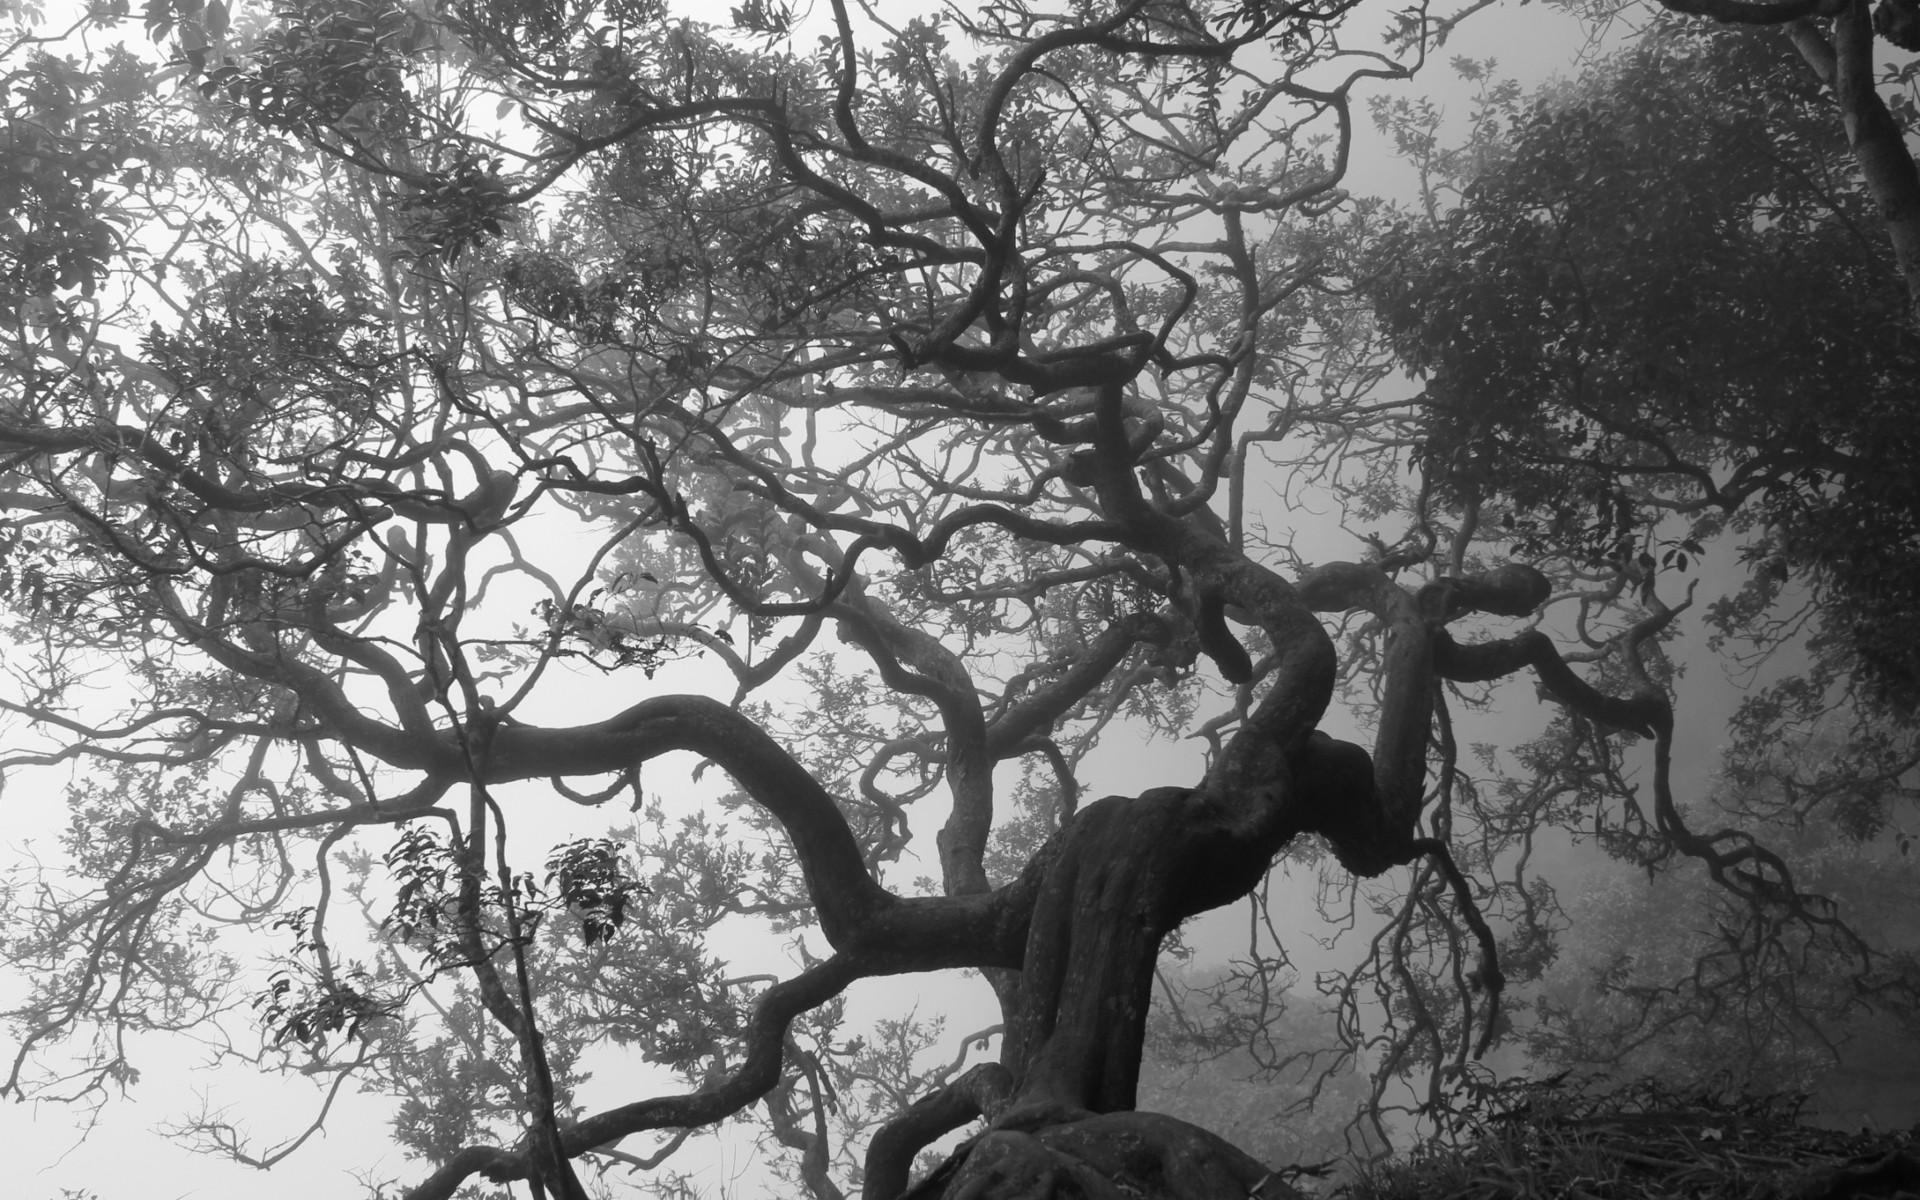 black white bw trees fog mist leaves wallpaper 1920x1200 35795 wallpaperup. Black Bedroom Furniture Sets. Home Design Ideas